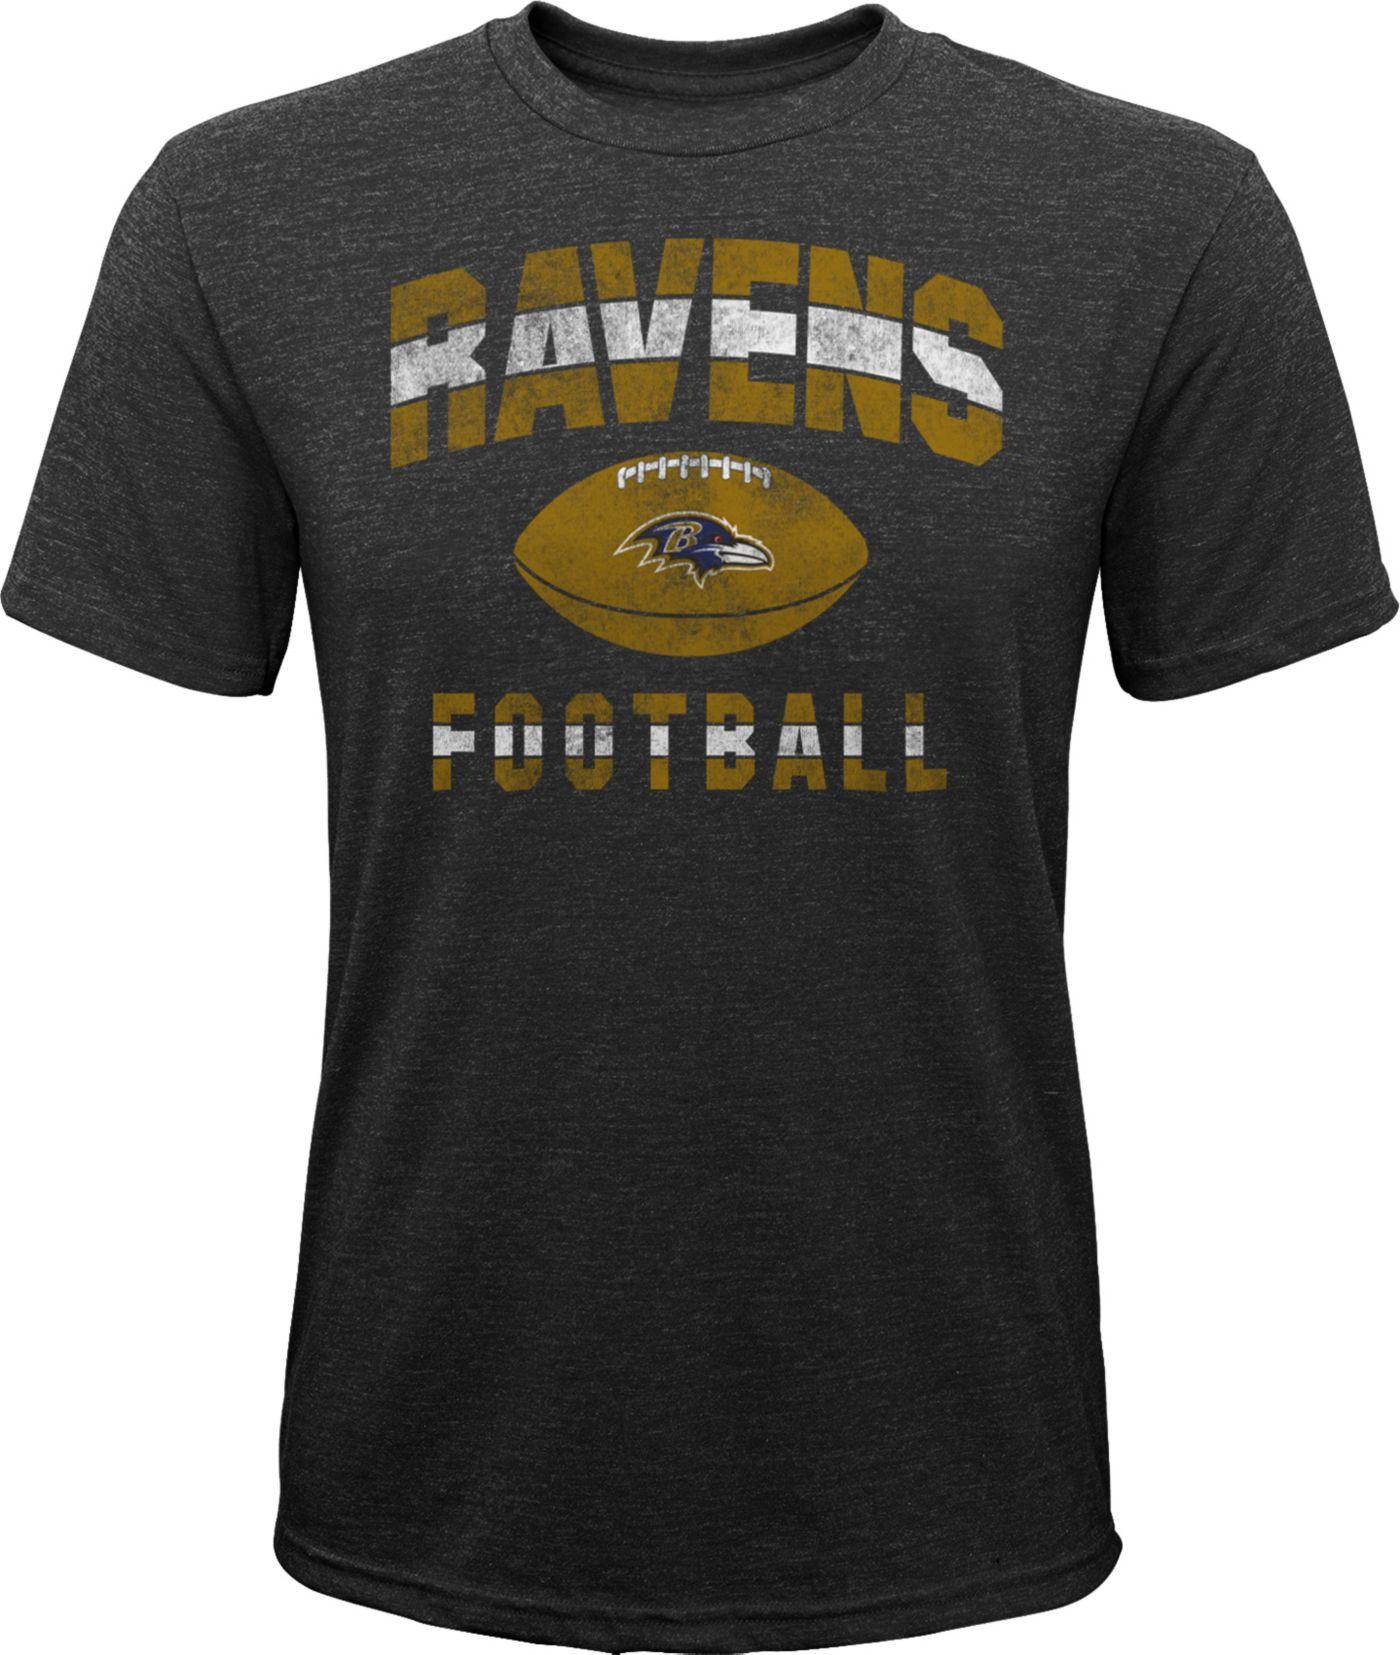 NFL Team Apparel Youth Baltimore Ravens Big Game Tri-Blend Black T-Shirt